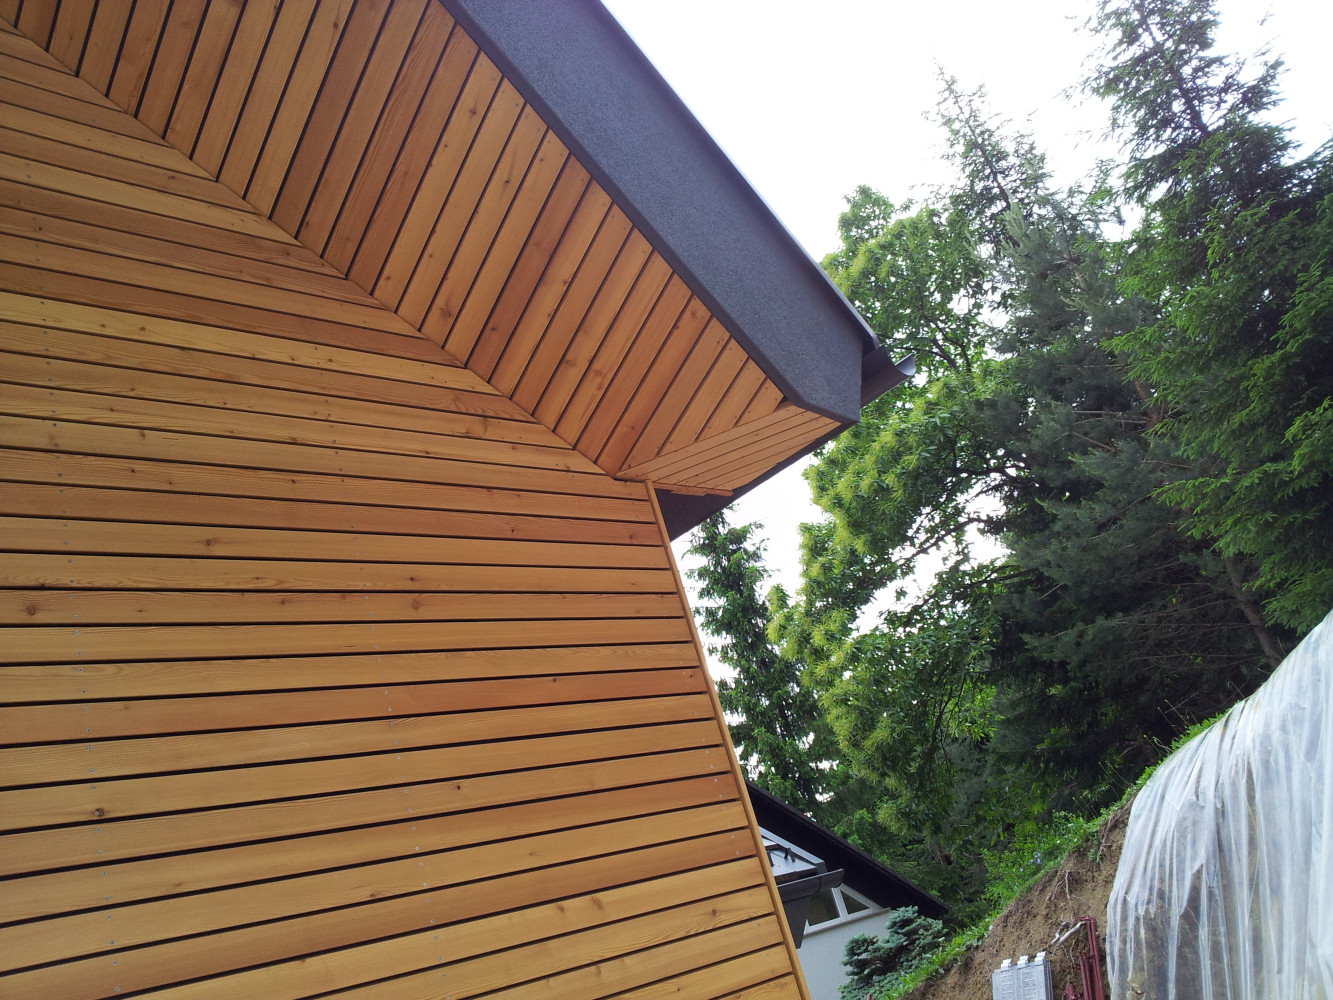 Lesena fasada Tržič - sibirski macesen - enaka fuga